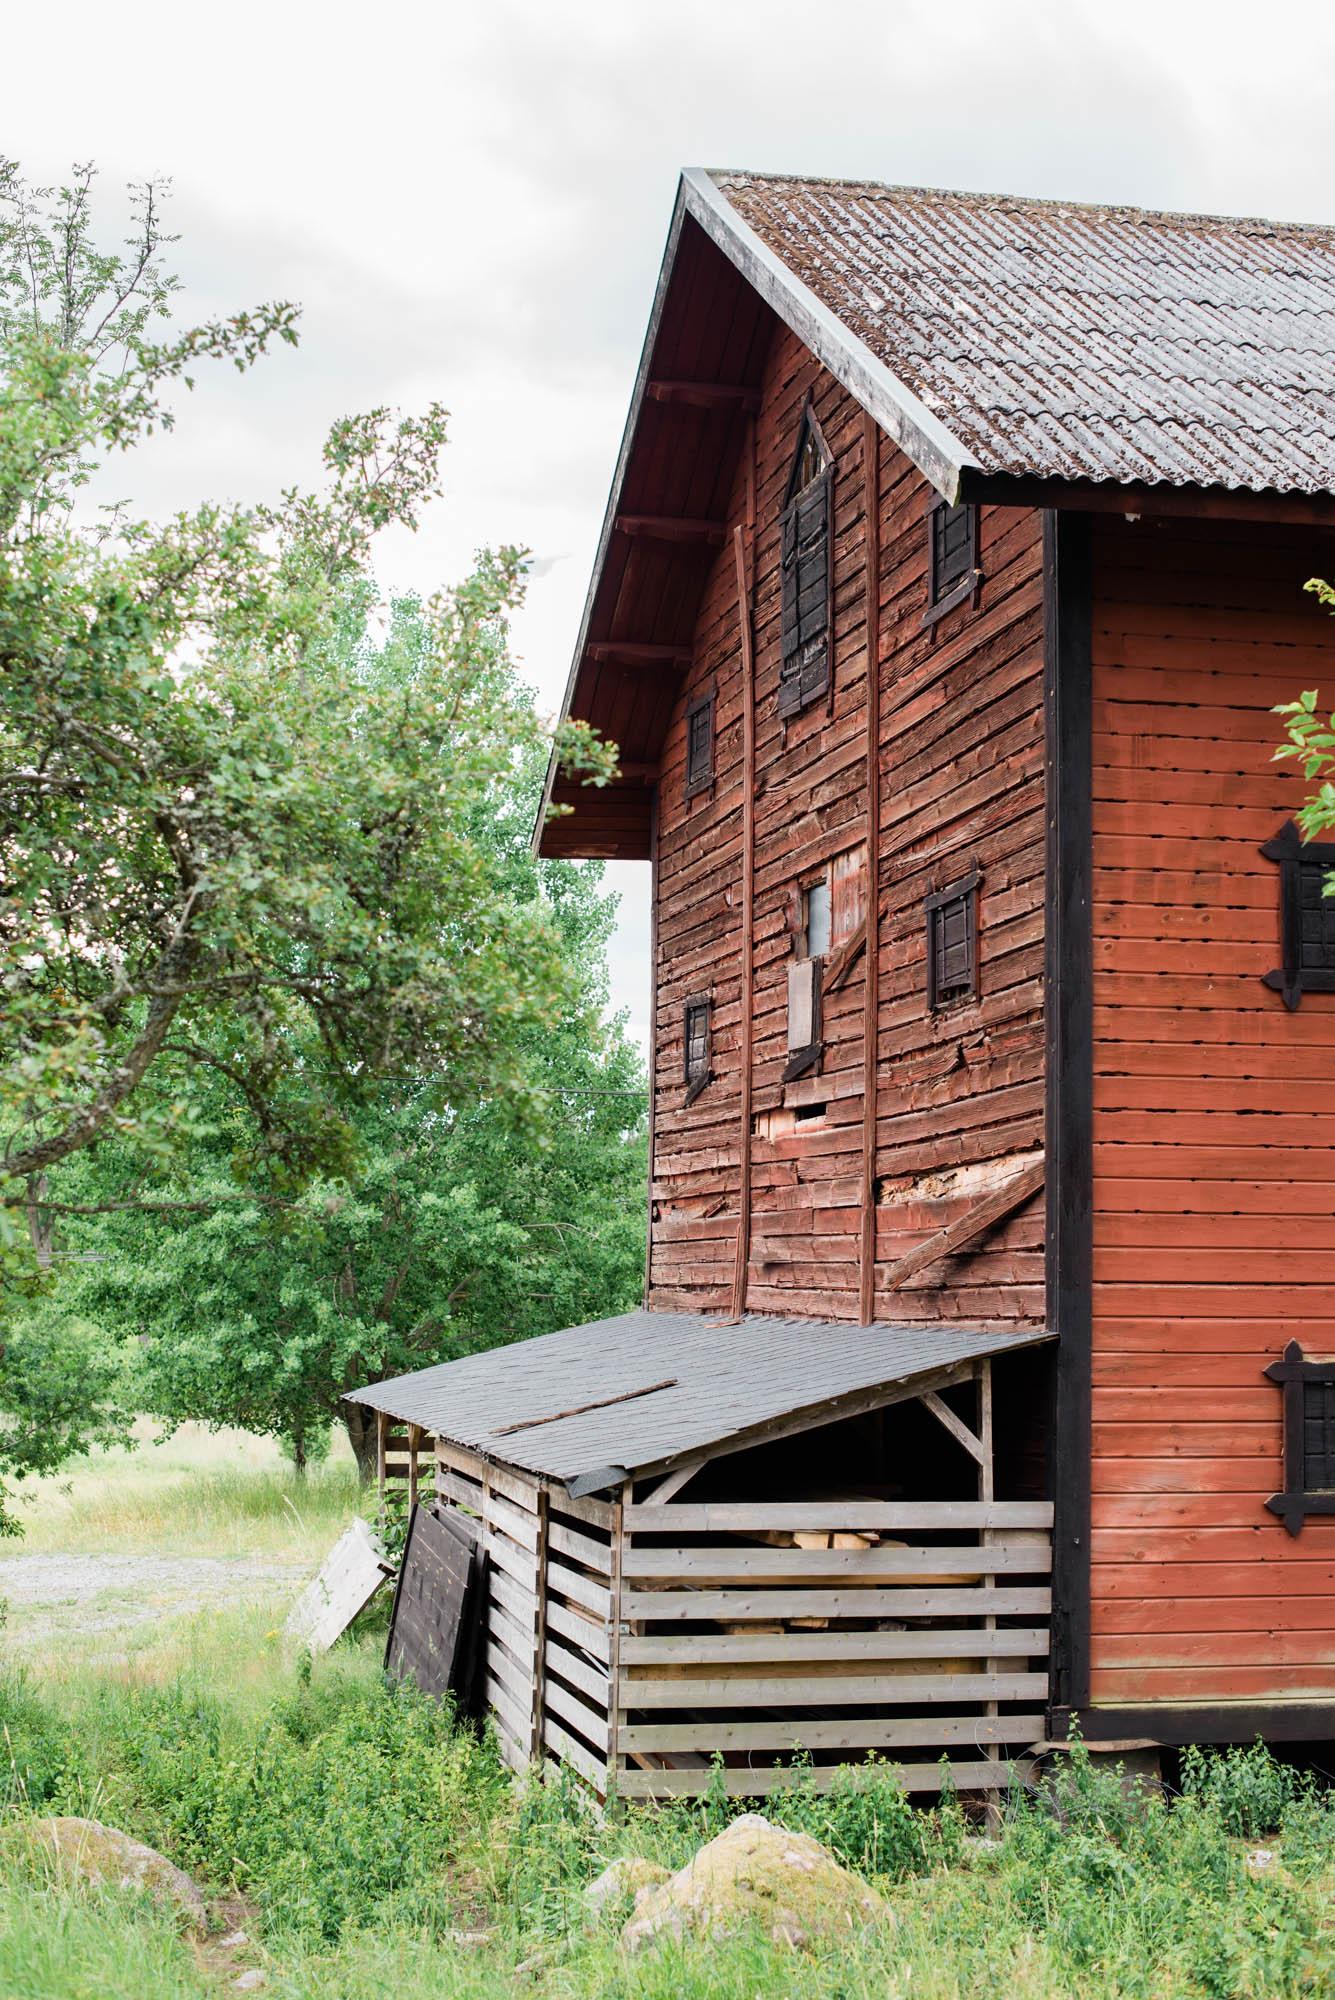 Web-hannah puechmarin-sweden-8809.jpg